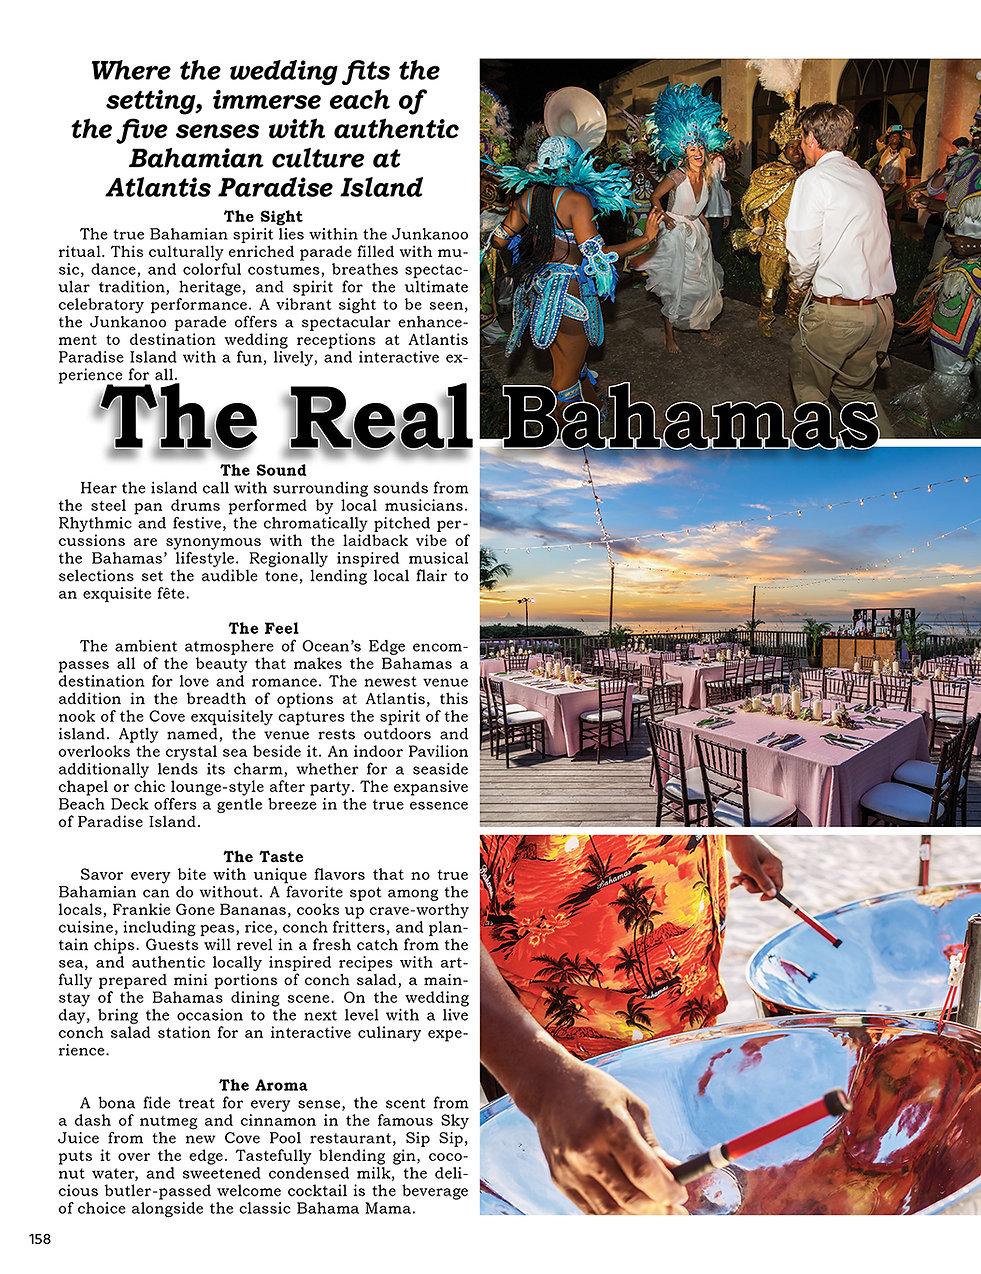 The_Real_Bahamas_WEB.jpg